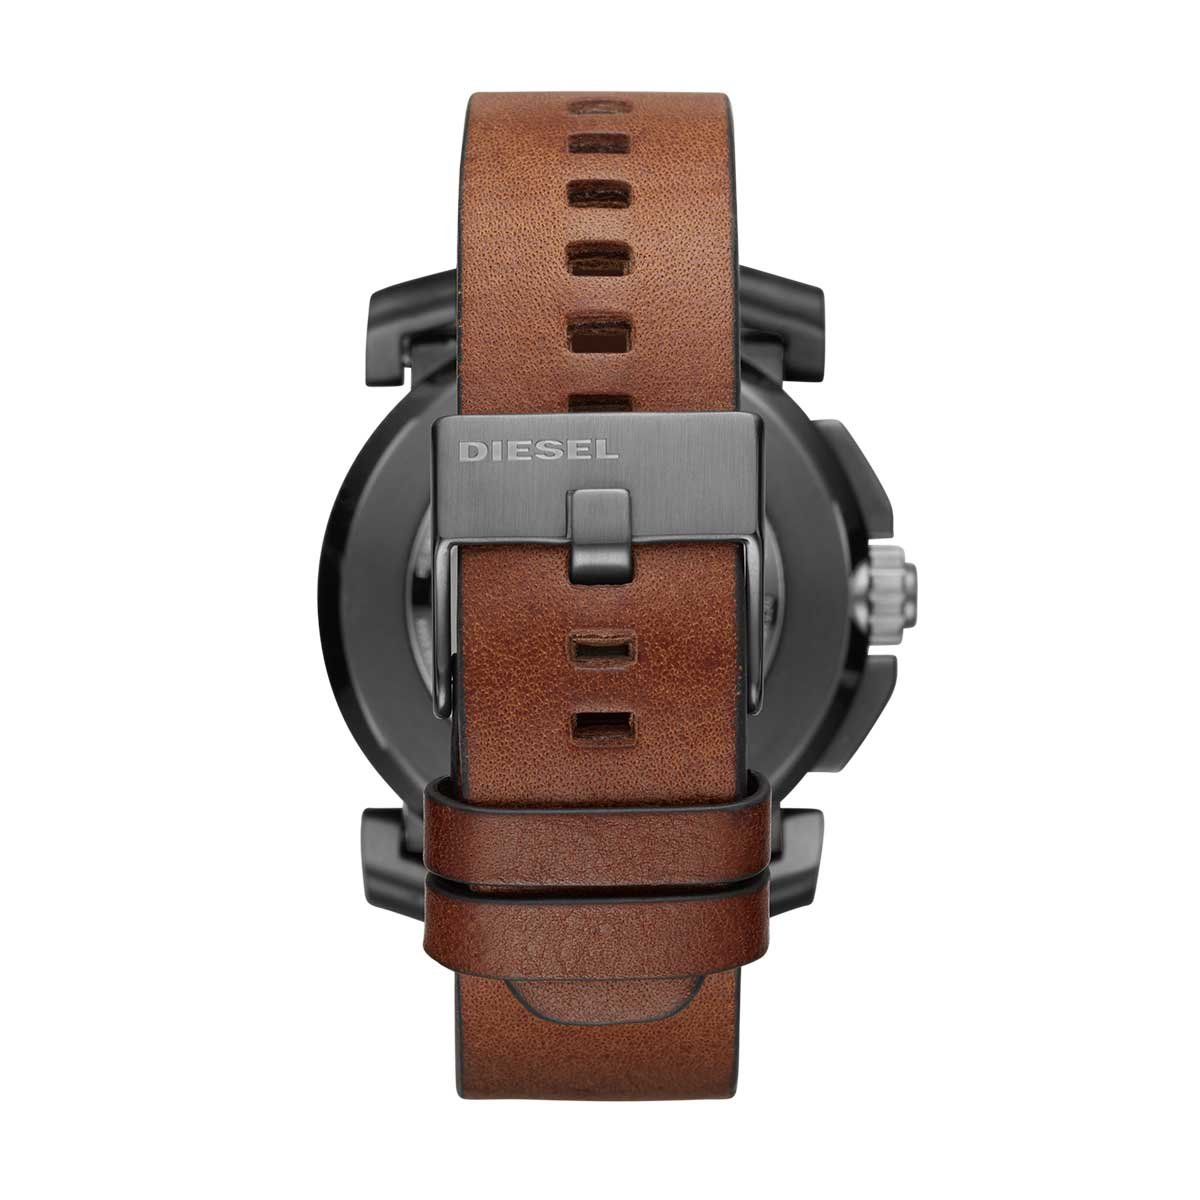 Smartwatch Caballero H 237 Brido Dieselon Dzt1003 Sears Com